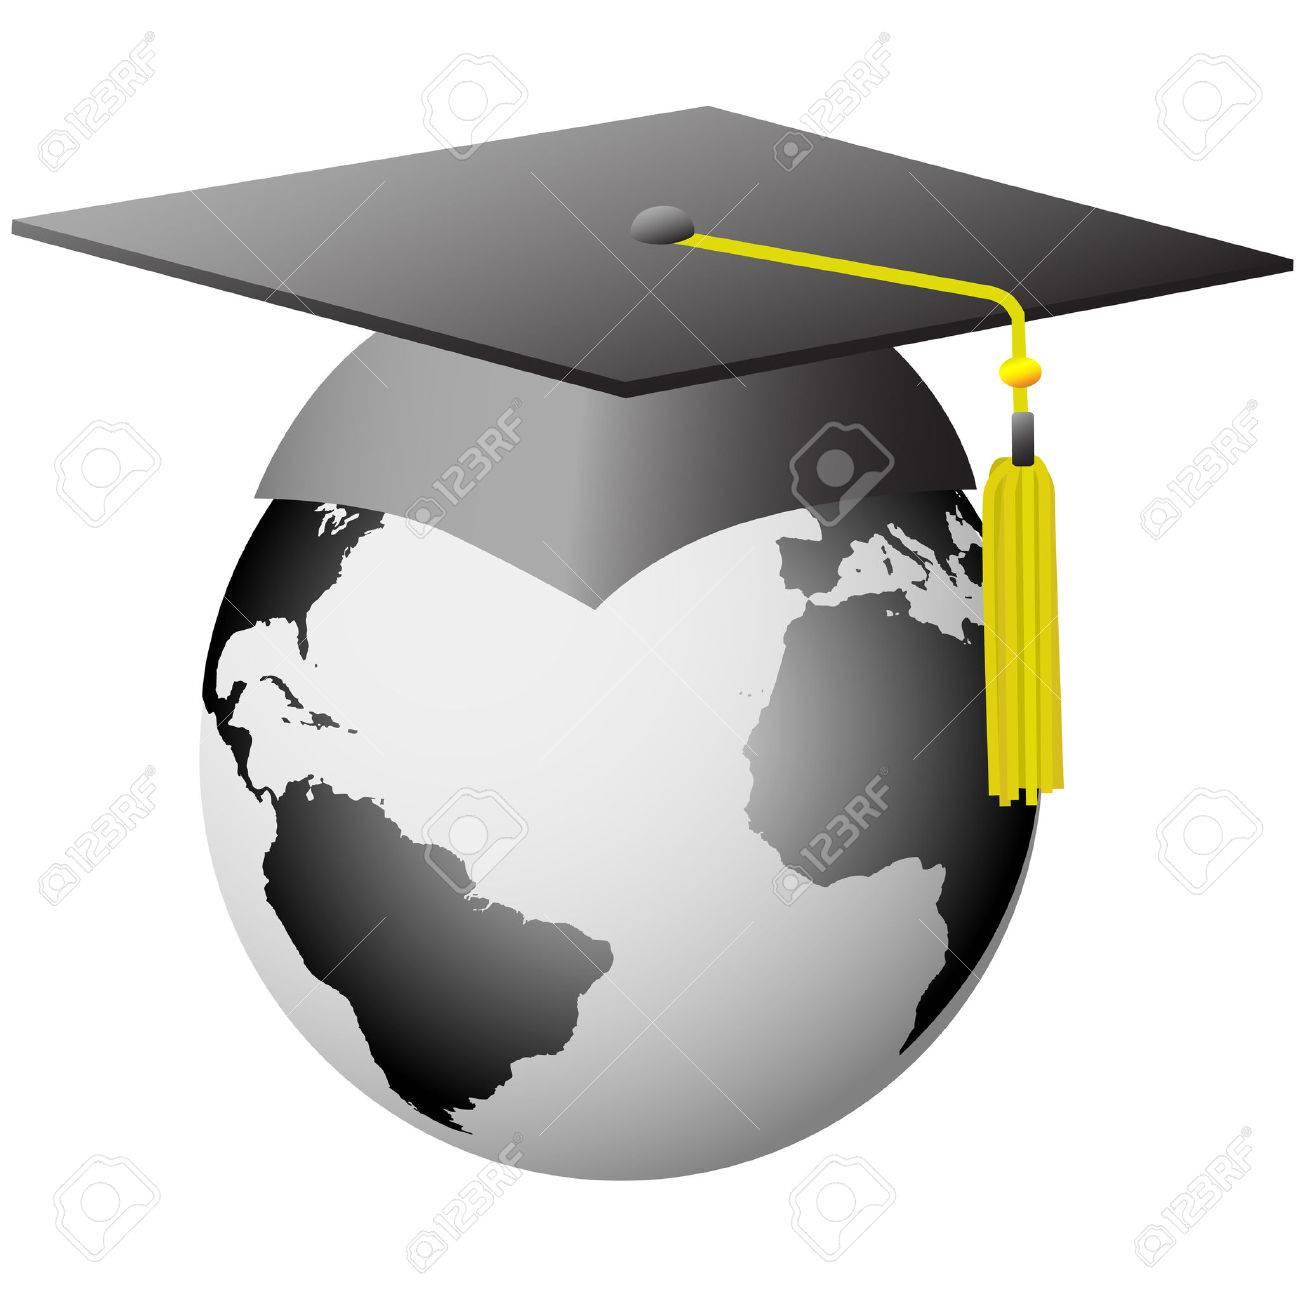 Education Symbols Clip Art Images Free Download